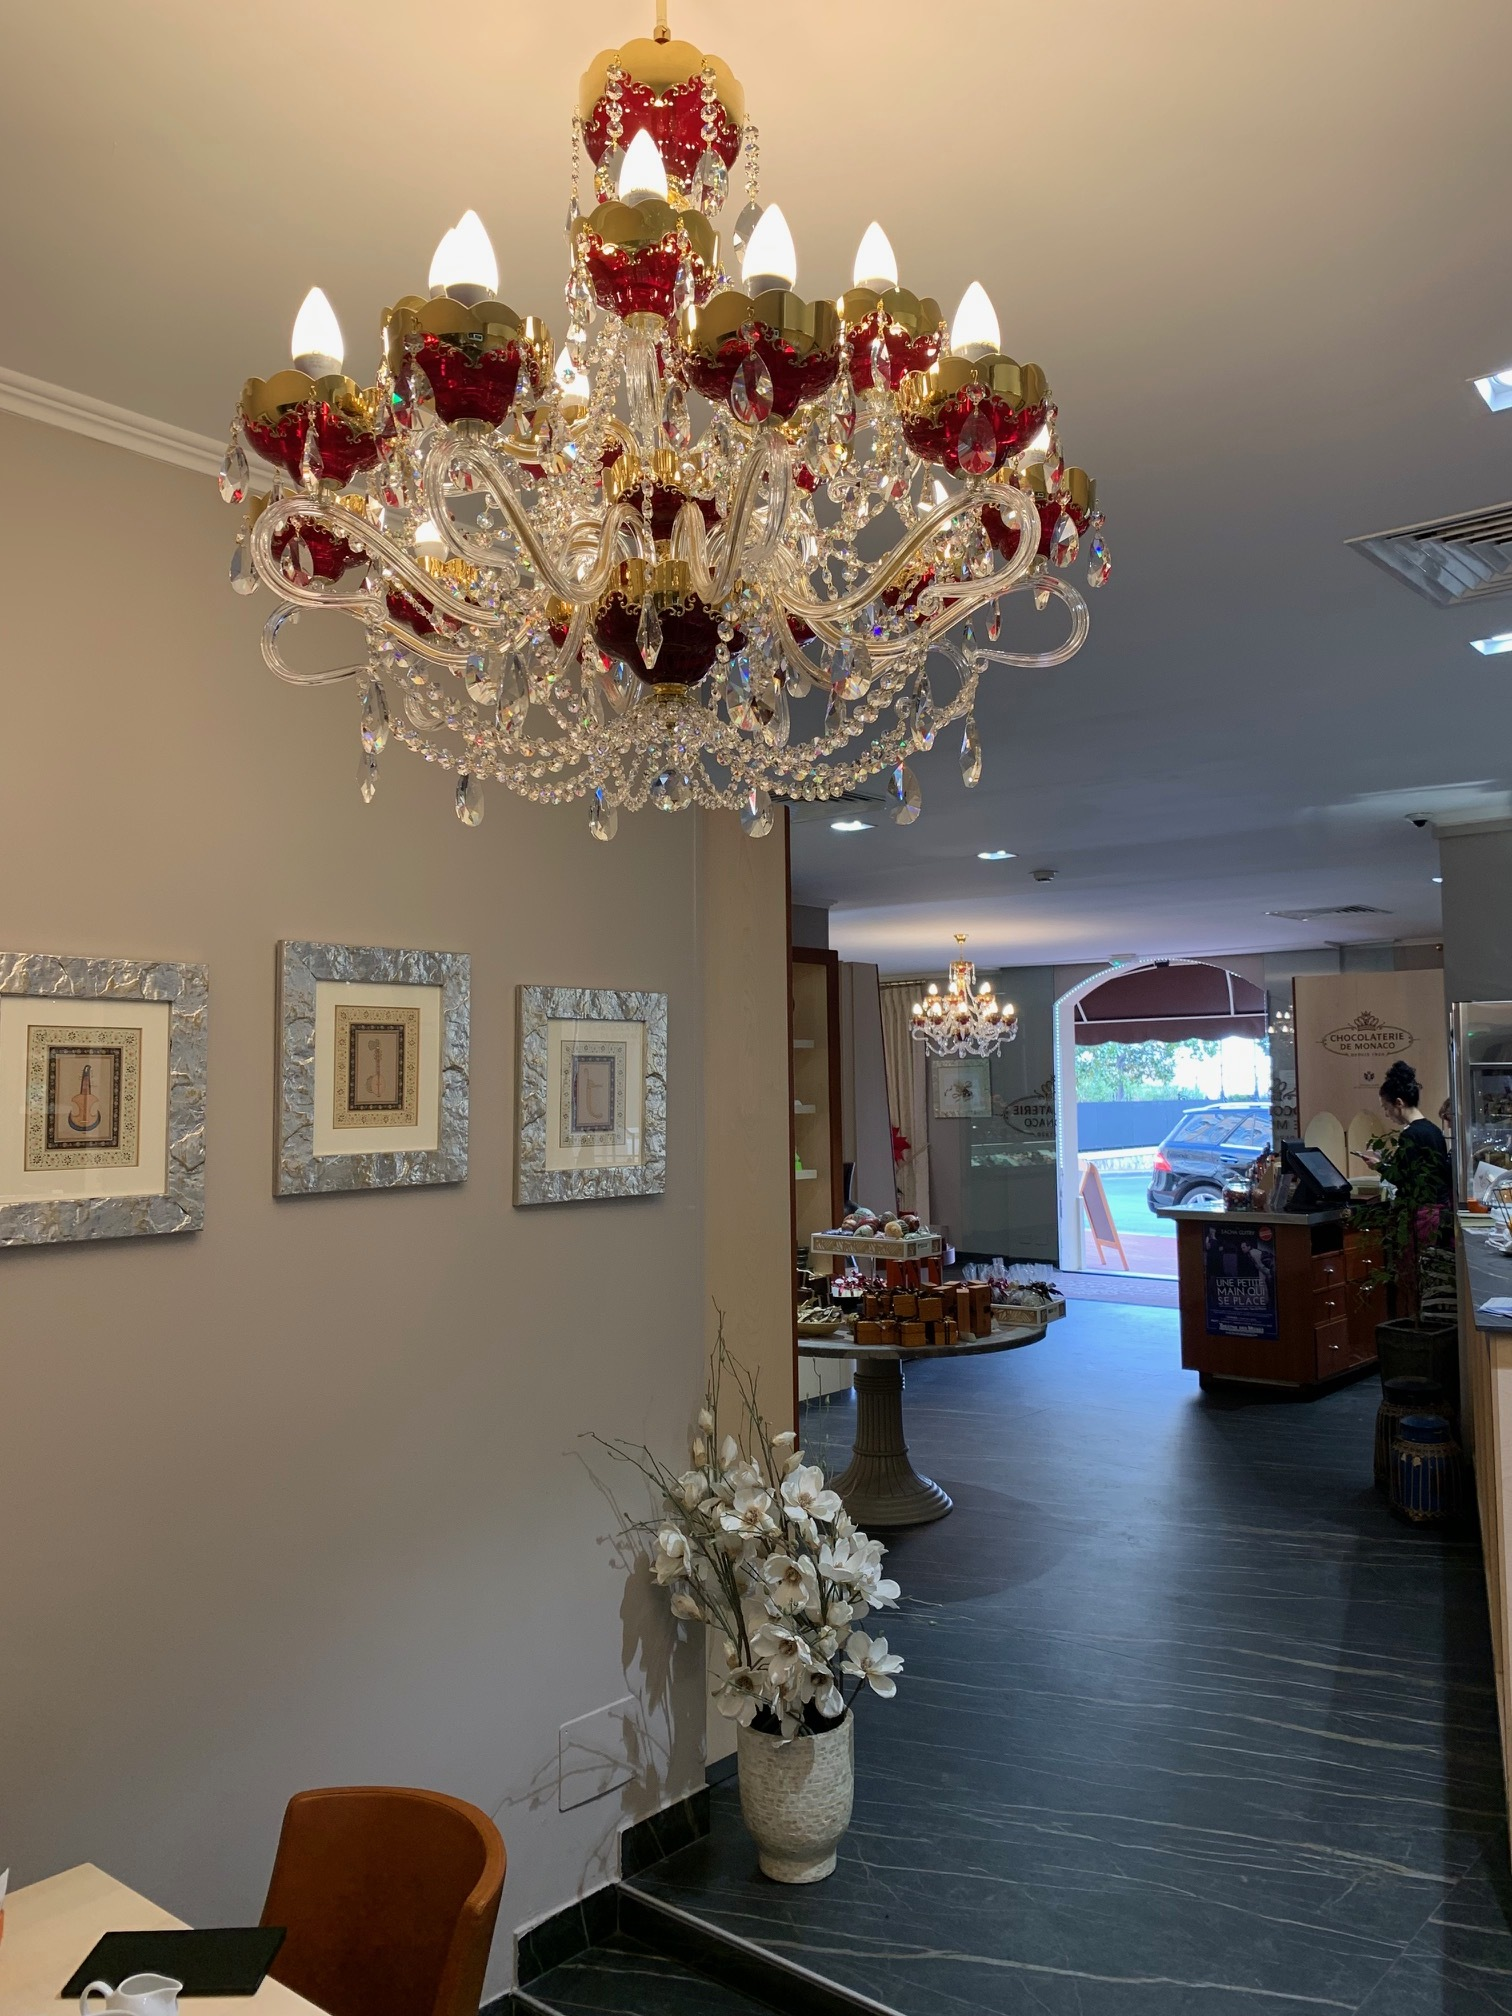 Chocolaterie-de-monaco-chandeliers-wranovsky-1.jpg